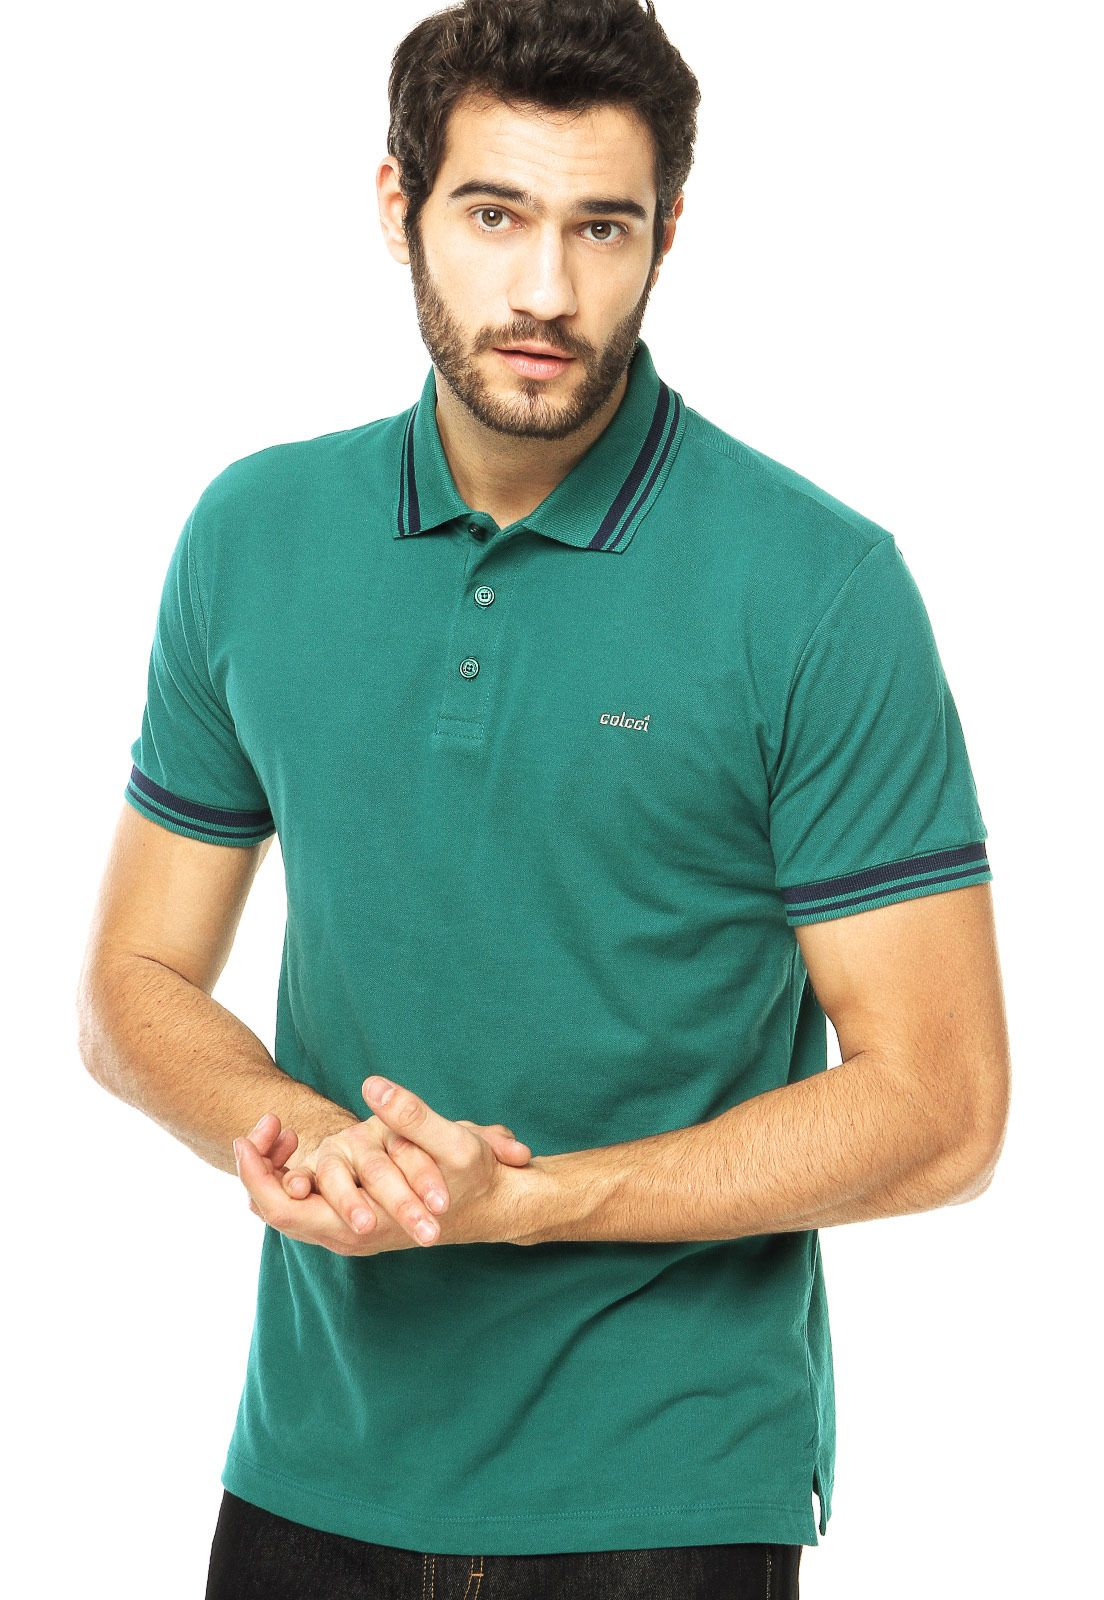 765466b1d3 Camisa Polo Colcci Verde - Compre Agora